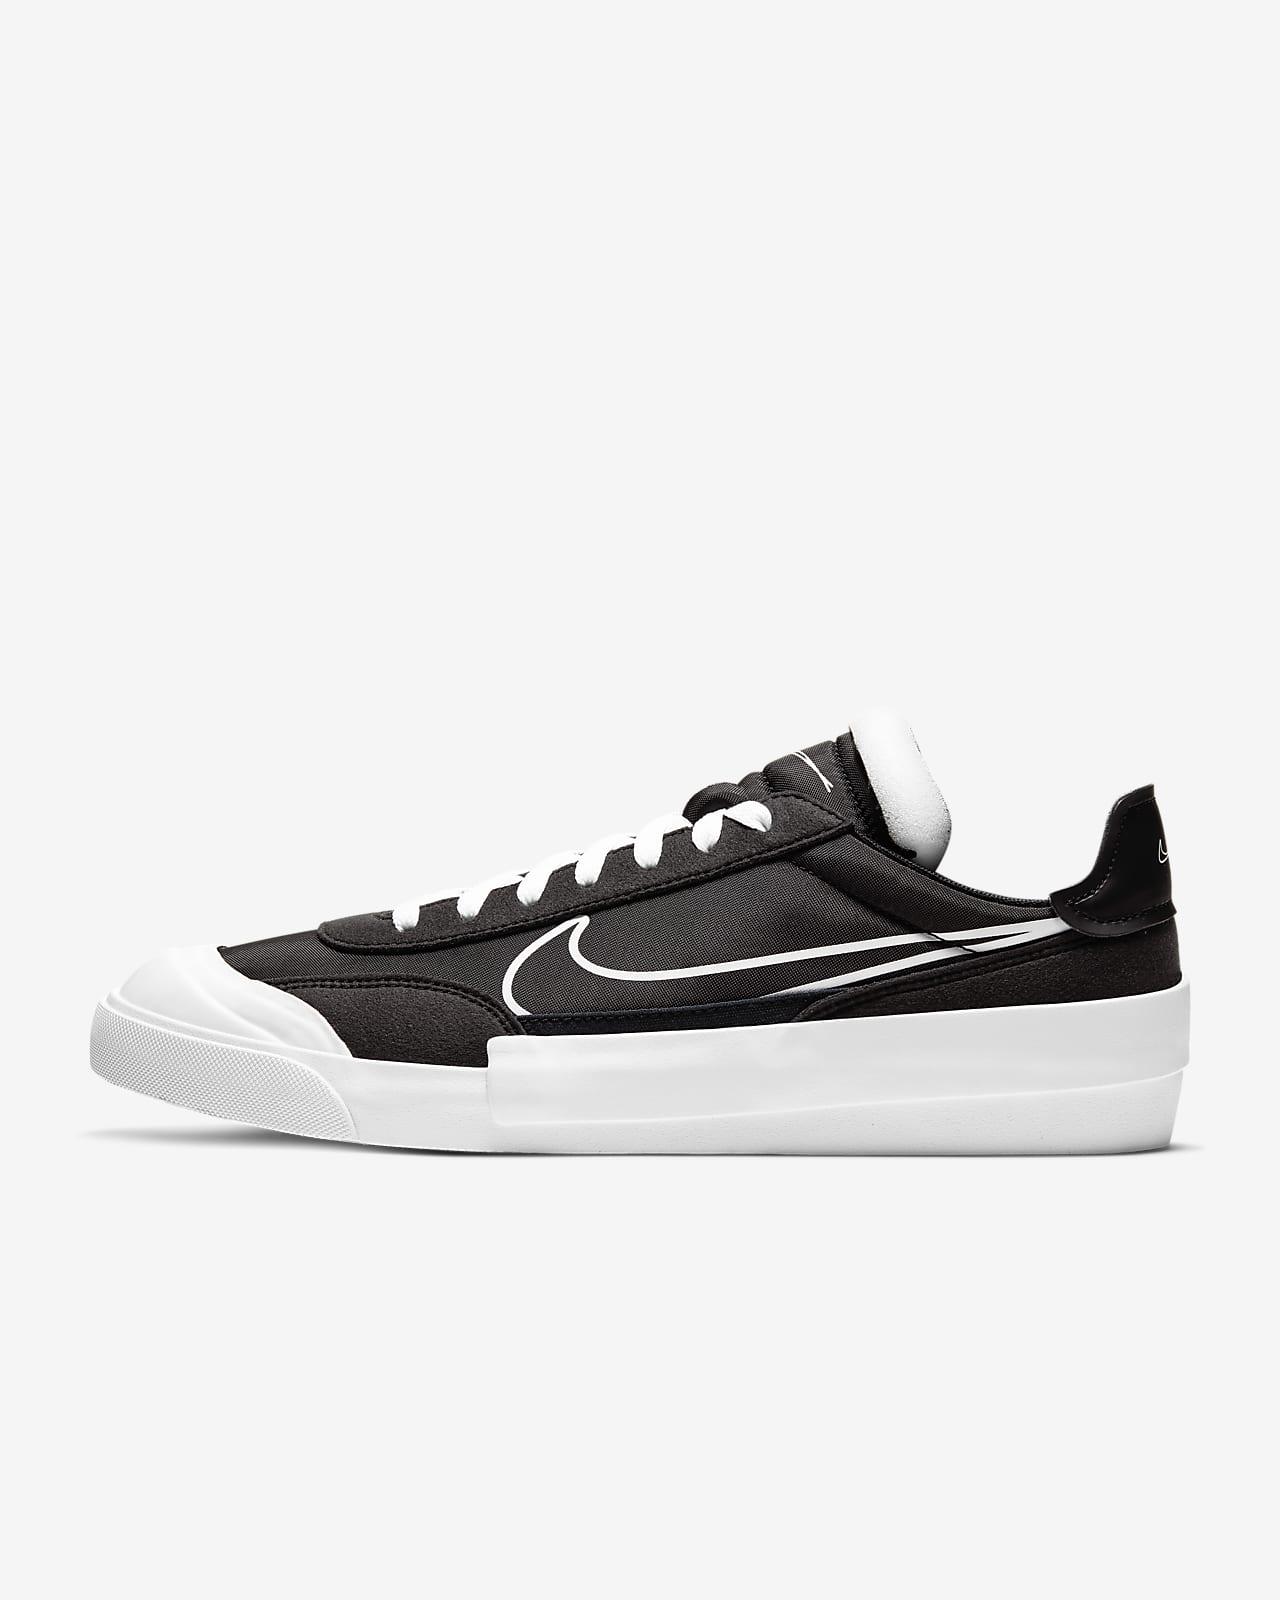 Nike Drop-Type sko